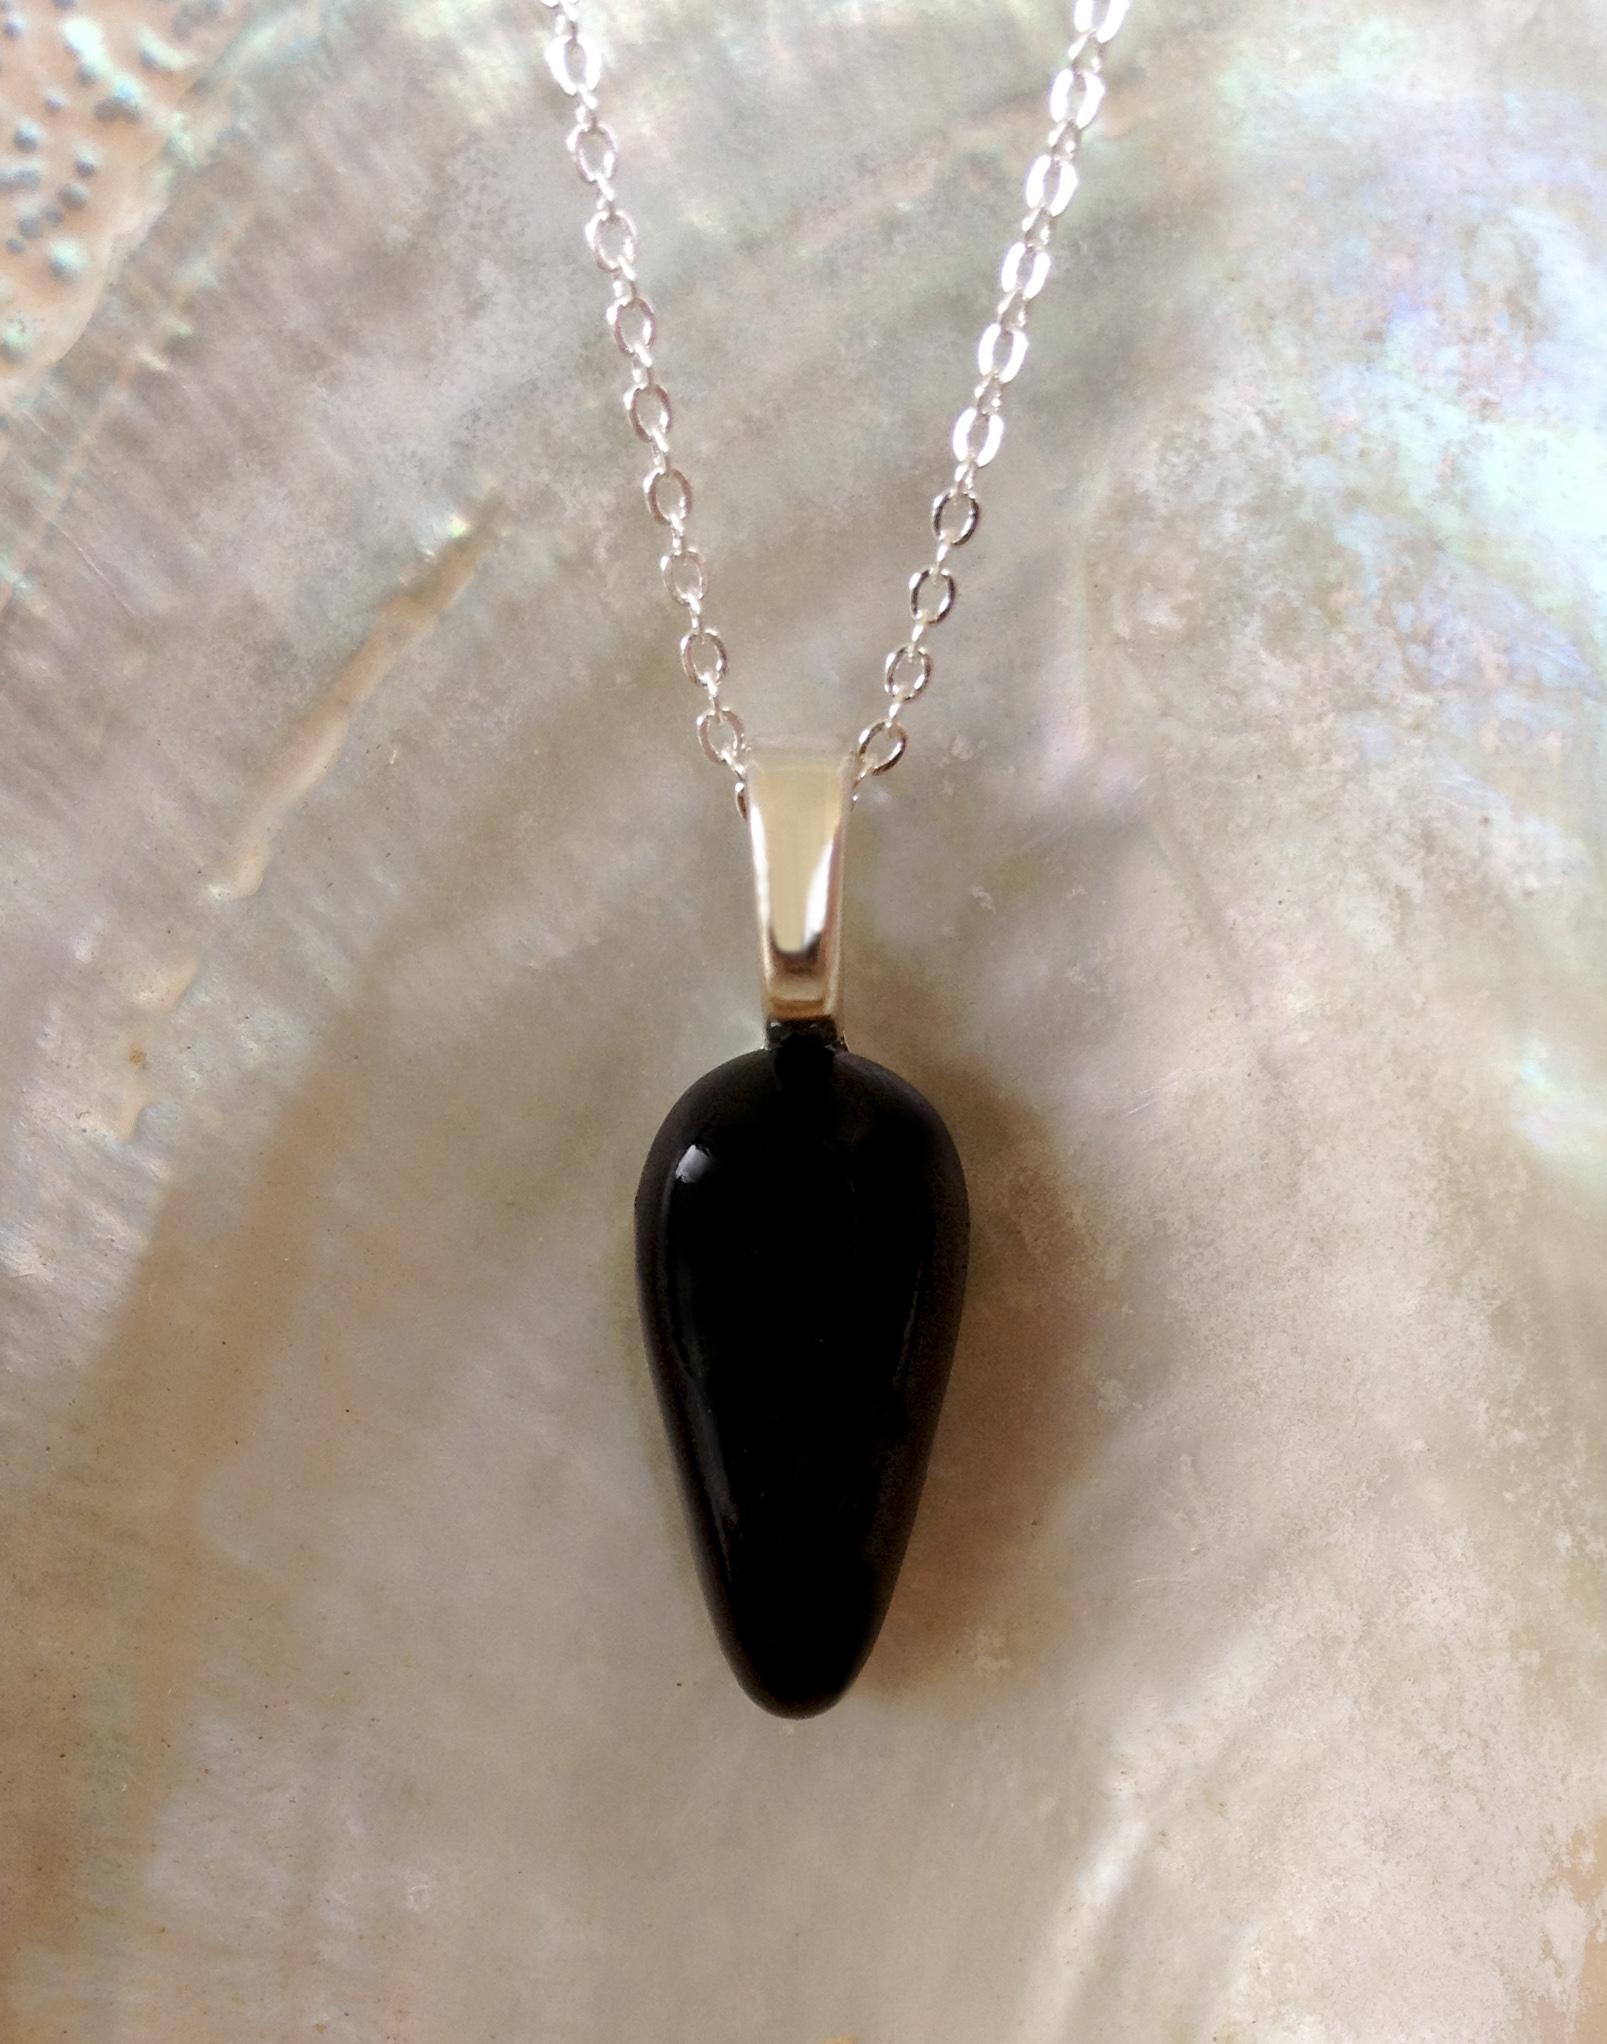 Enhanced orgone black pendant divine kauai by divine kauai beautiful enhanced orgonite pendant from divine kauai powerful necklace orgone jewelry aloadofball Images